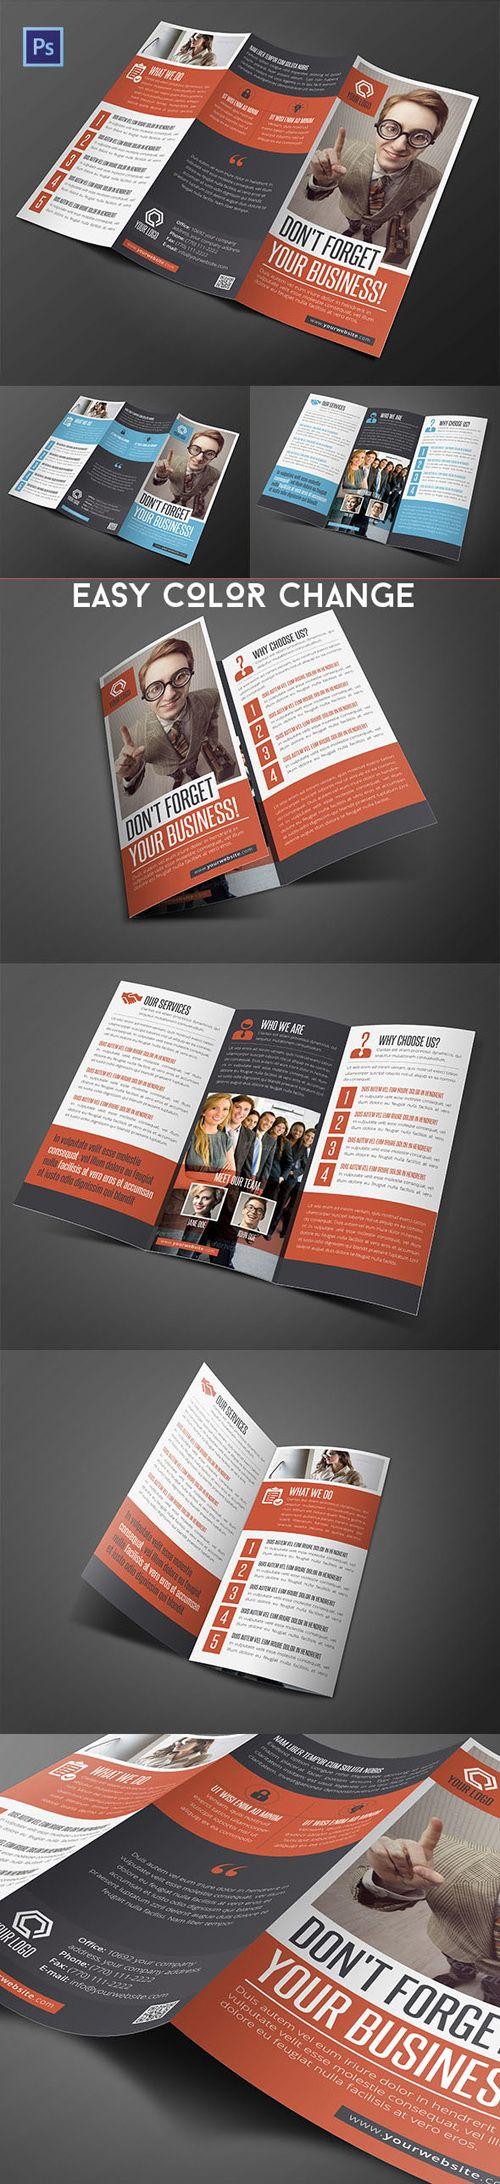 Multipurpose Business Trifold Brochure